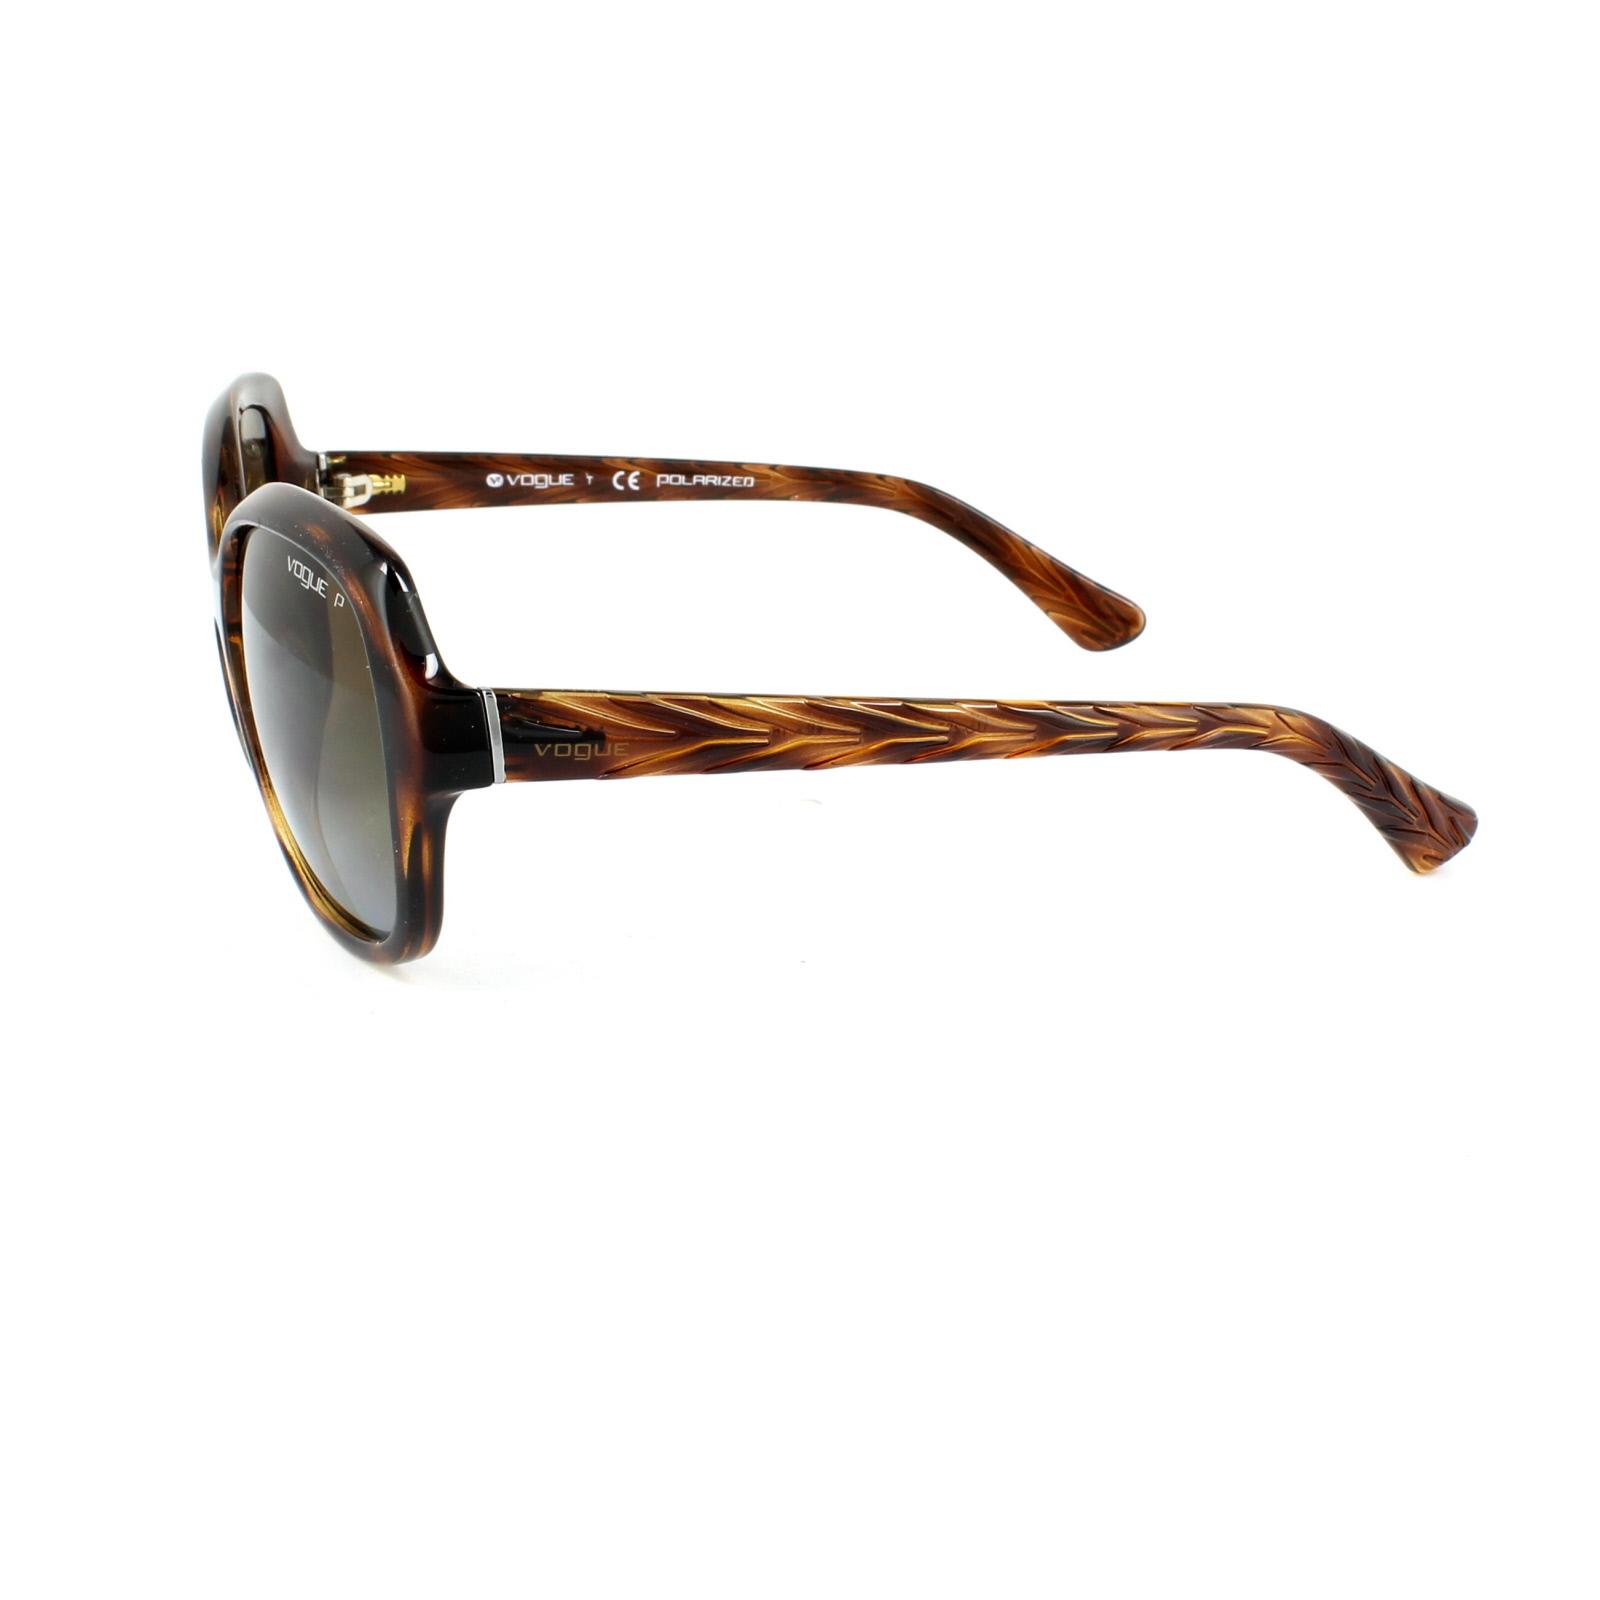 2c4c7a006fdf2 Sentinel Vogue Sunglasses 2871S 1508T5 Dark Havana Brown Gradient Polarized